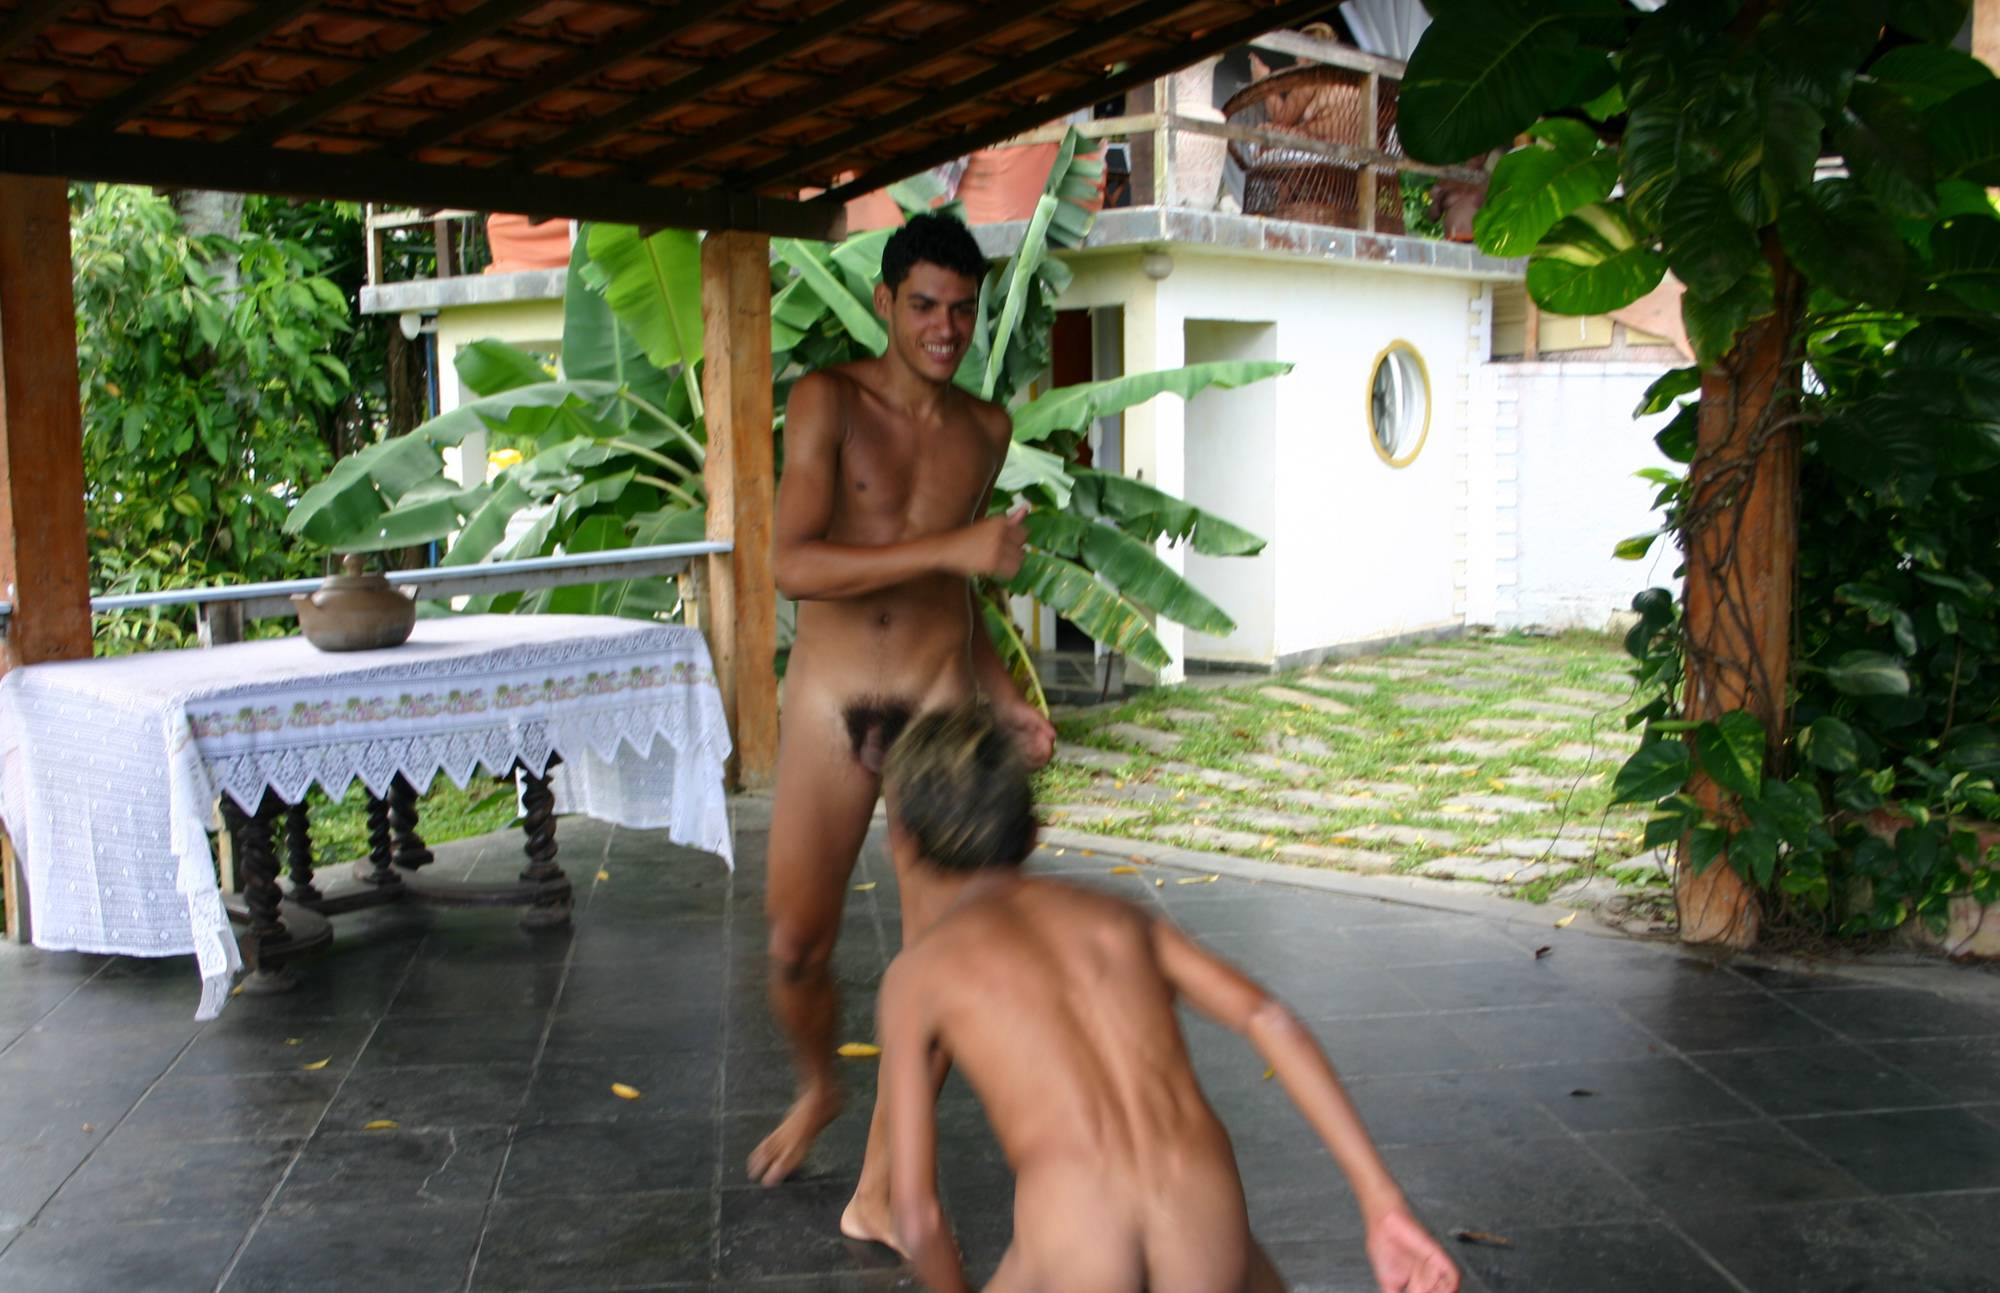 Brazilian Men Are Dancing - 1